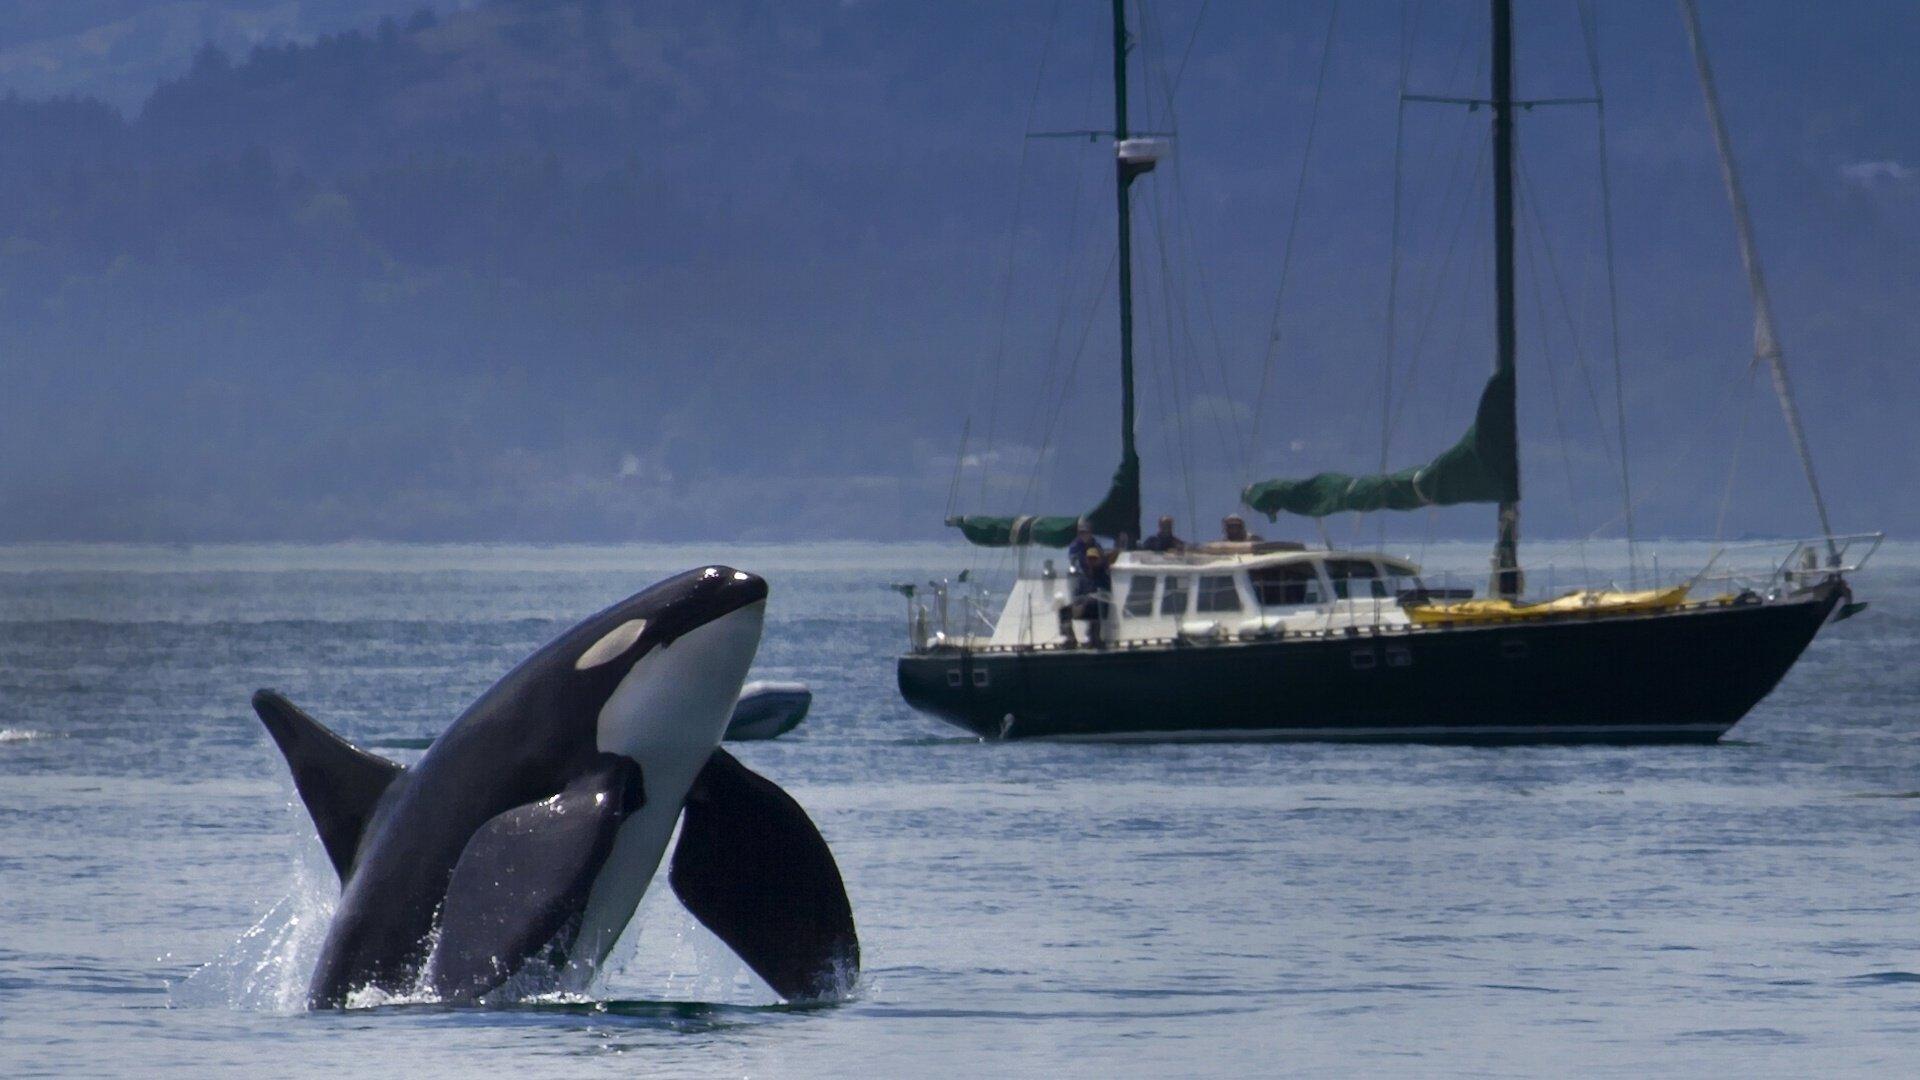 Wallpaper 1920x1080 Px Boat Killer Orca Ship Whale